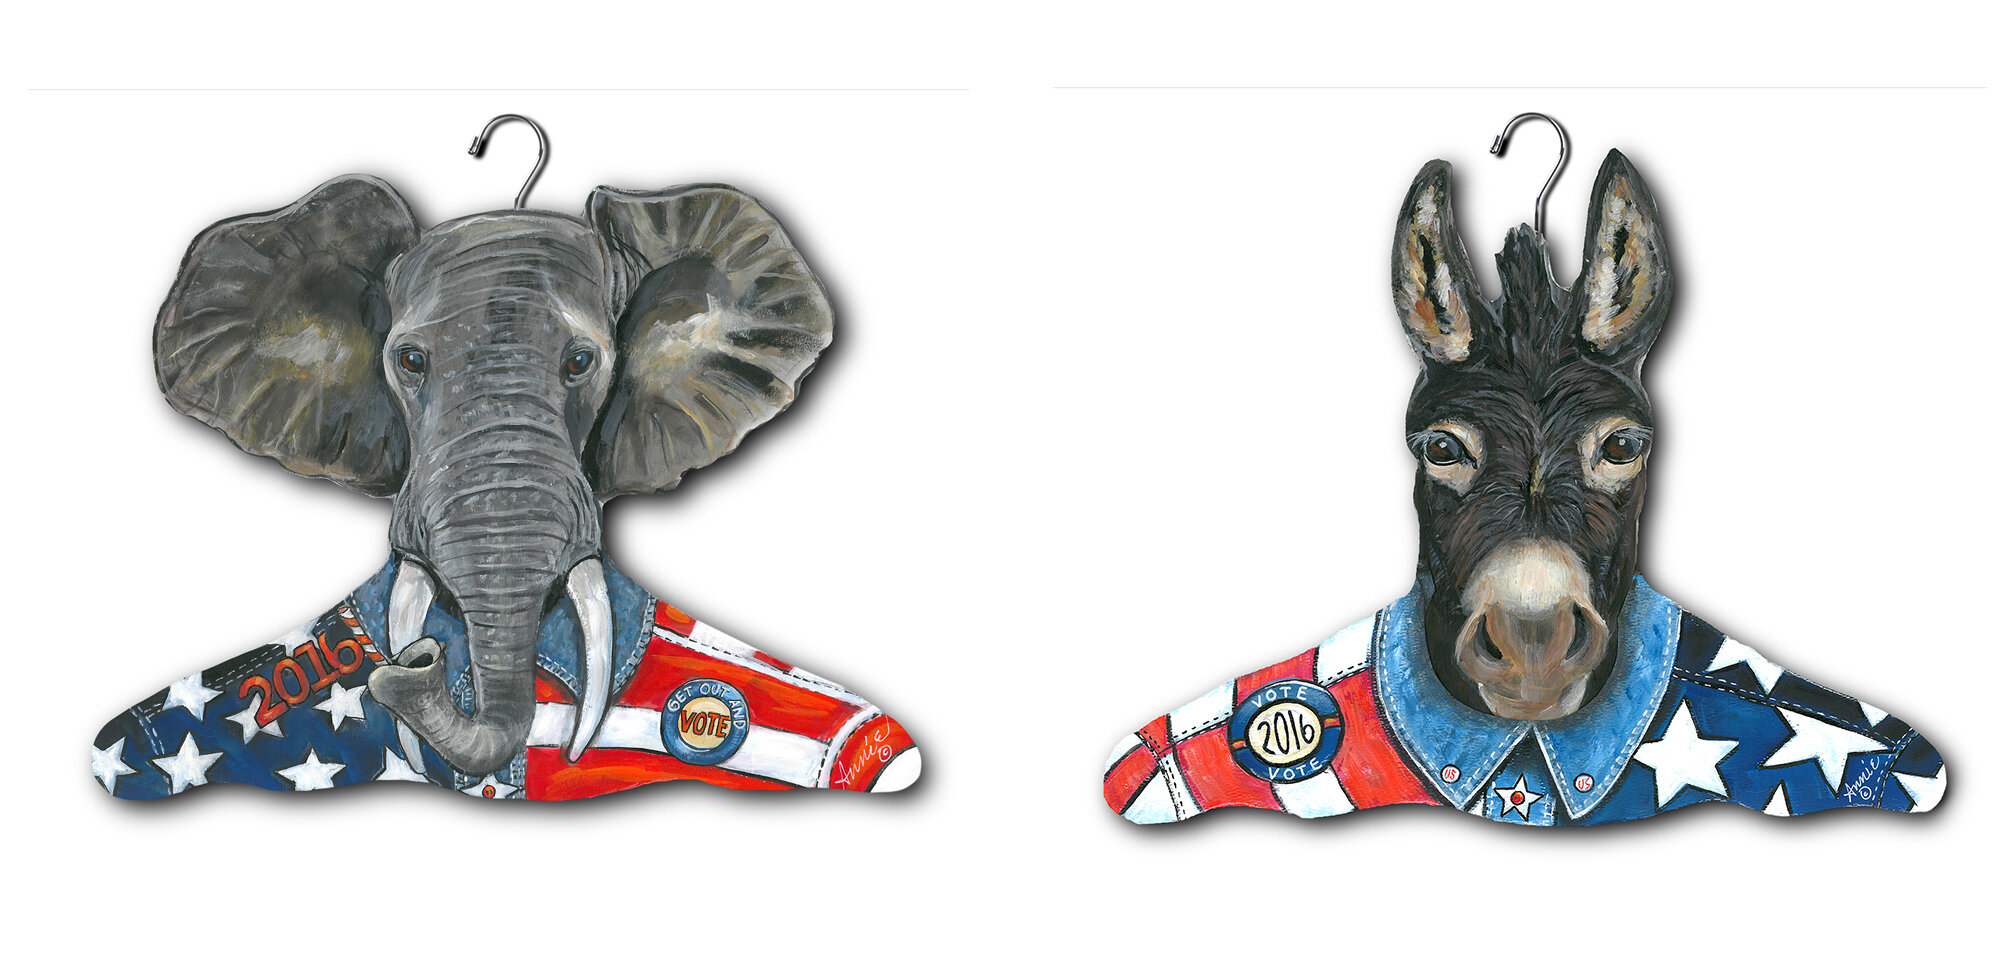 32fceb2657 Stupell industries republican elephant and democratic donkey clothing  hangers wayfair jpg 2000x979 Streamlined donkey